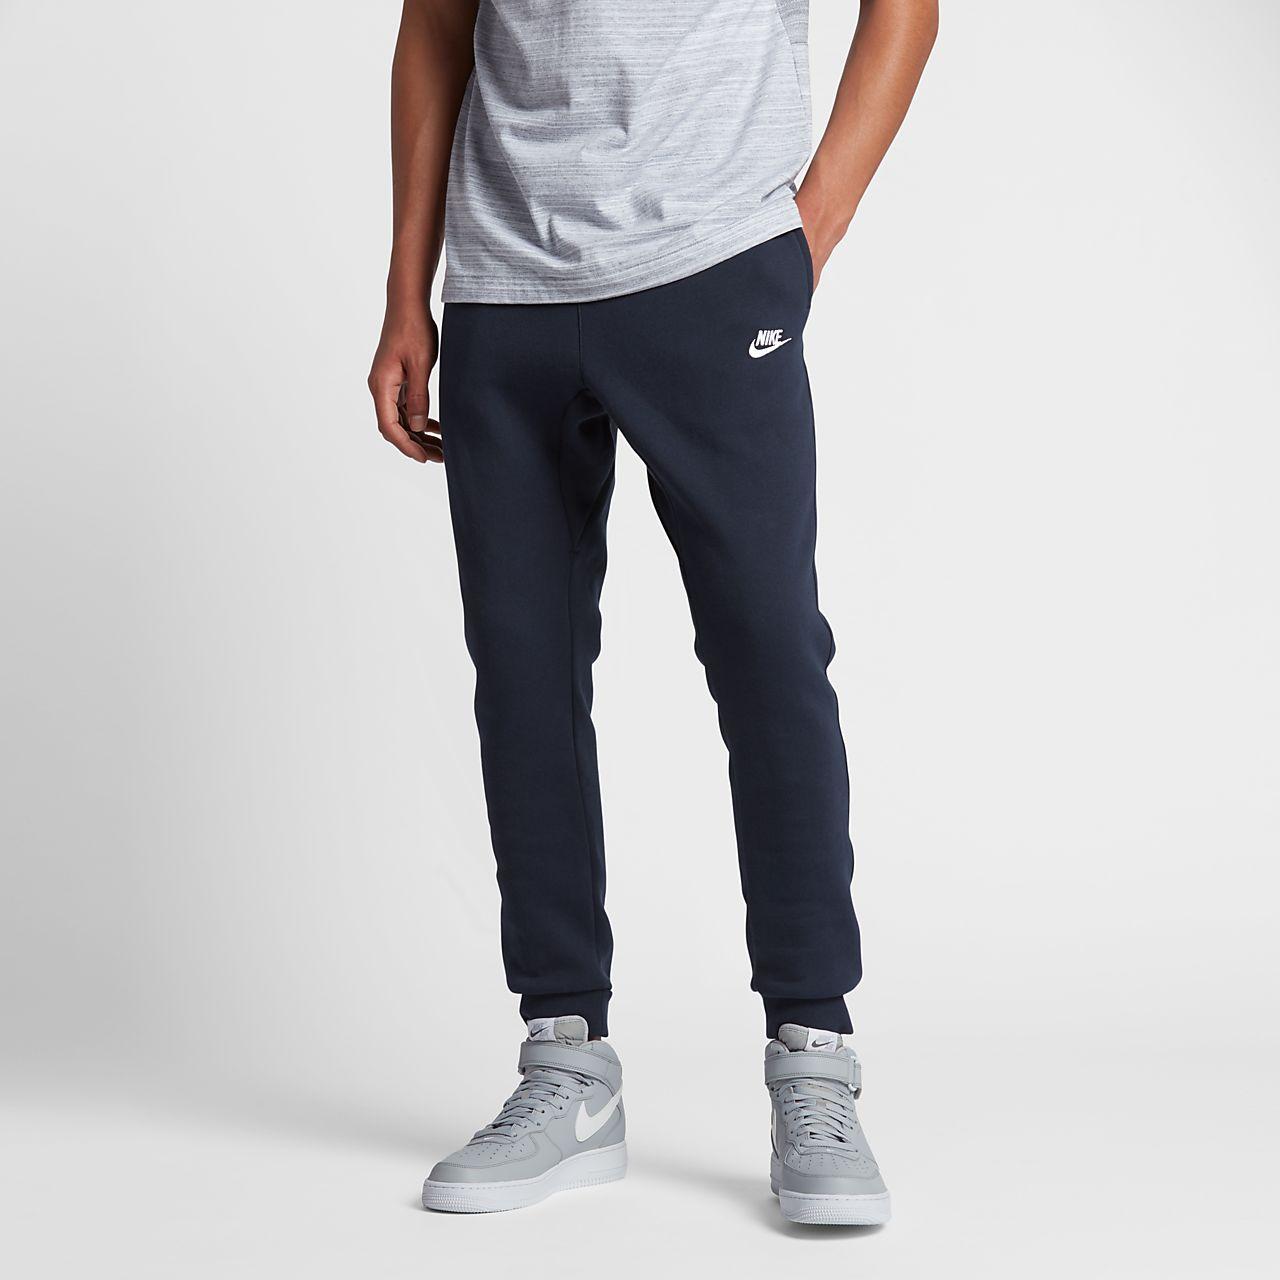 7d6e9cf71f0 Pantalon de jogging Nike Sportswear Club Fleece pour Homme. Nike.com BE